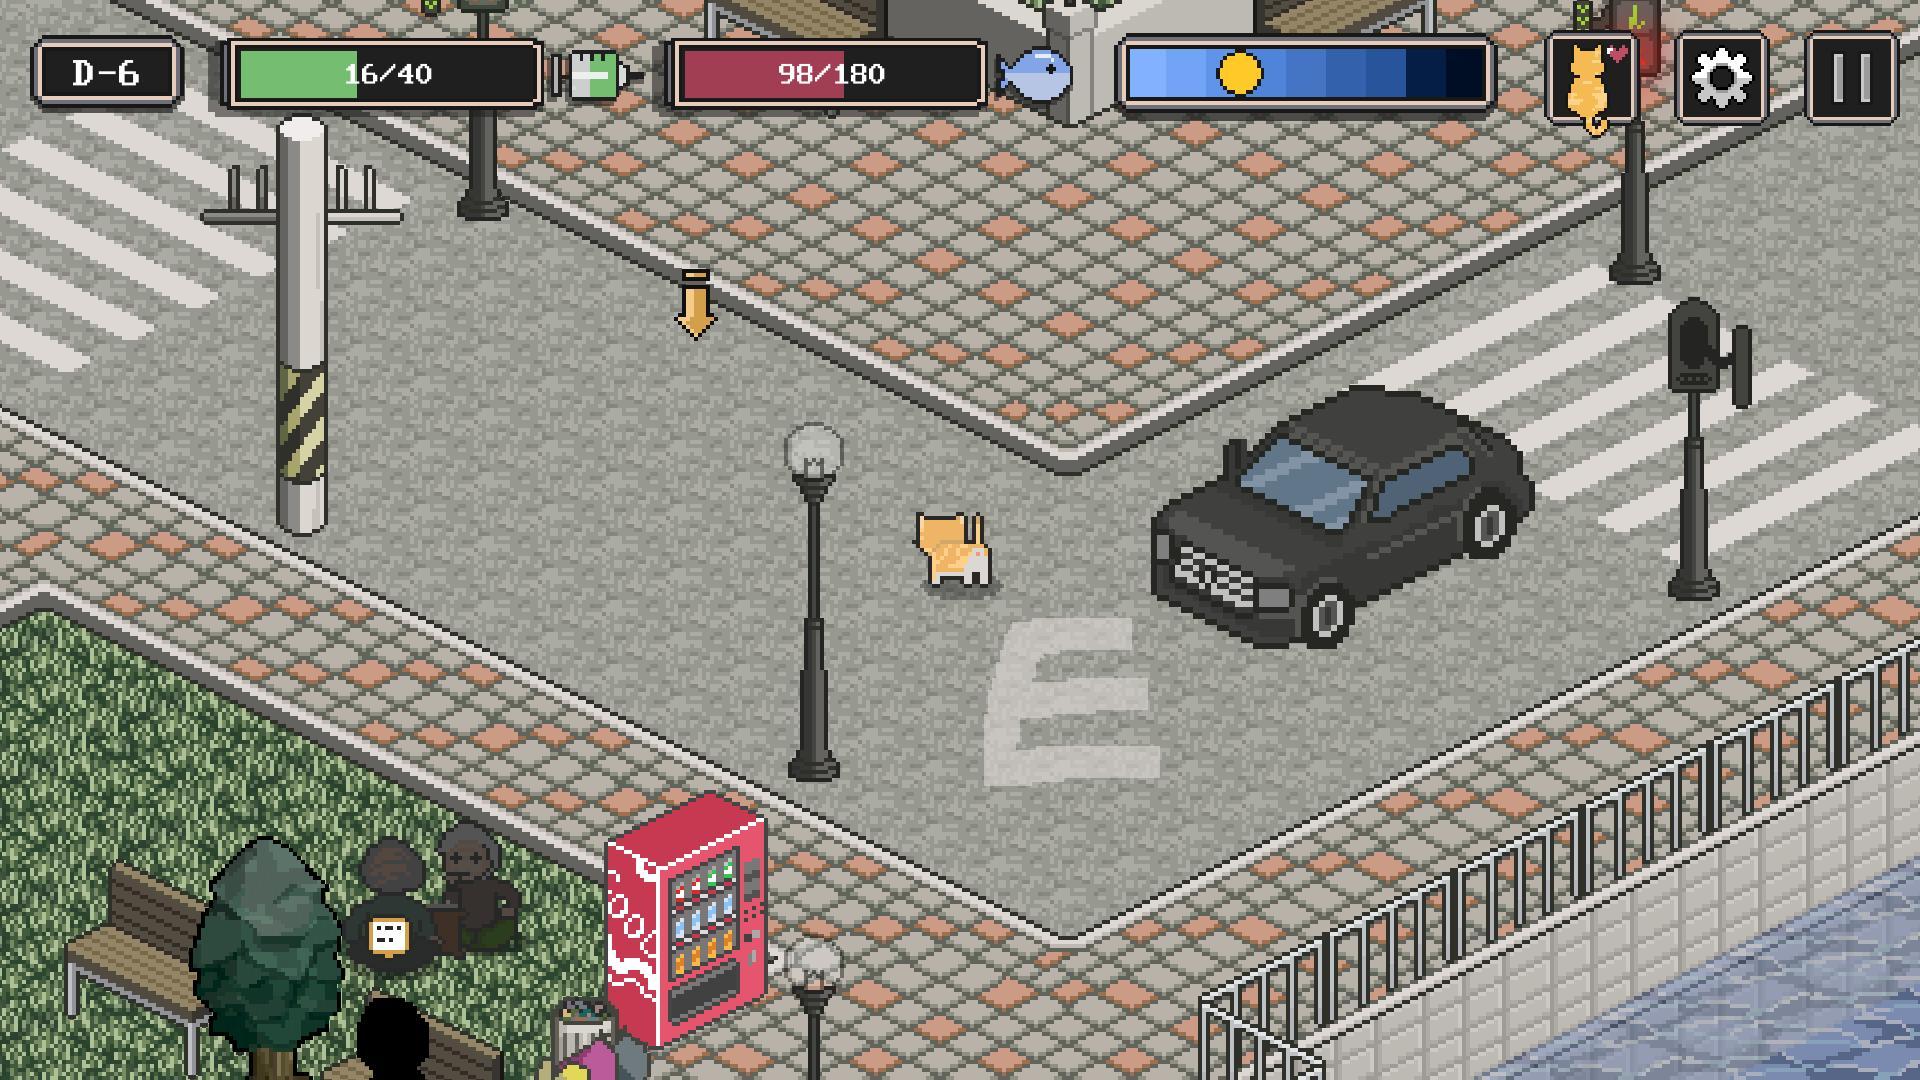 A Street Cat's Tale 2.99 Screenshot 3